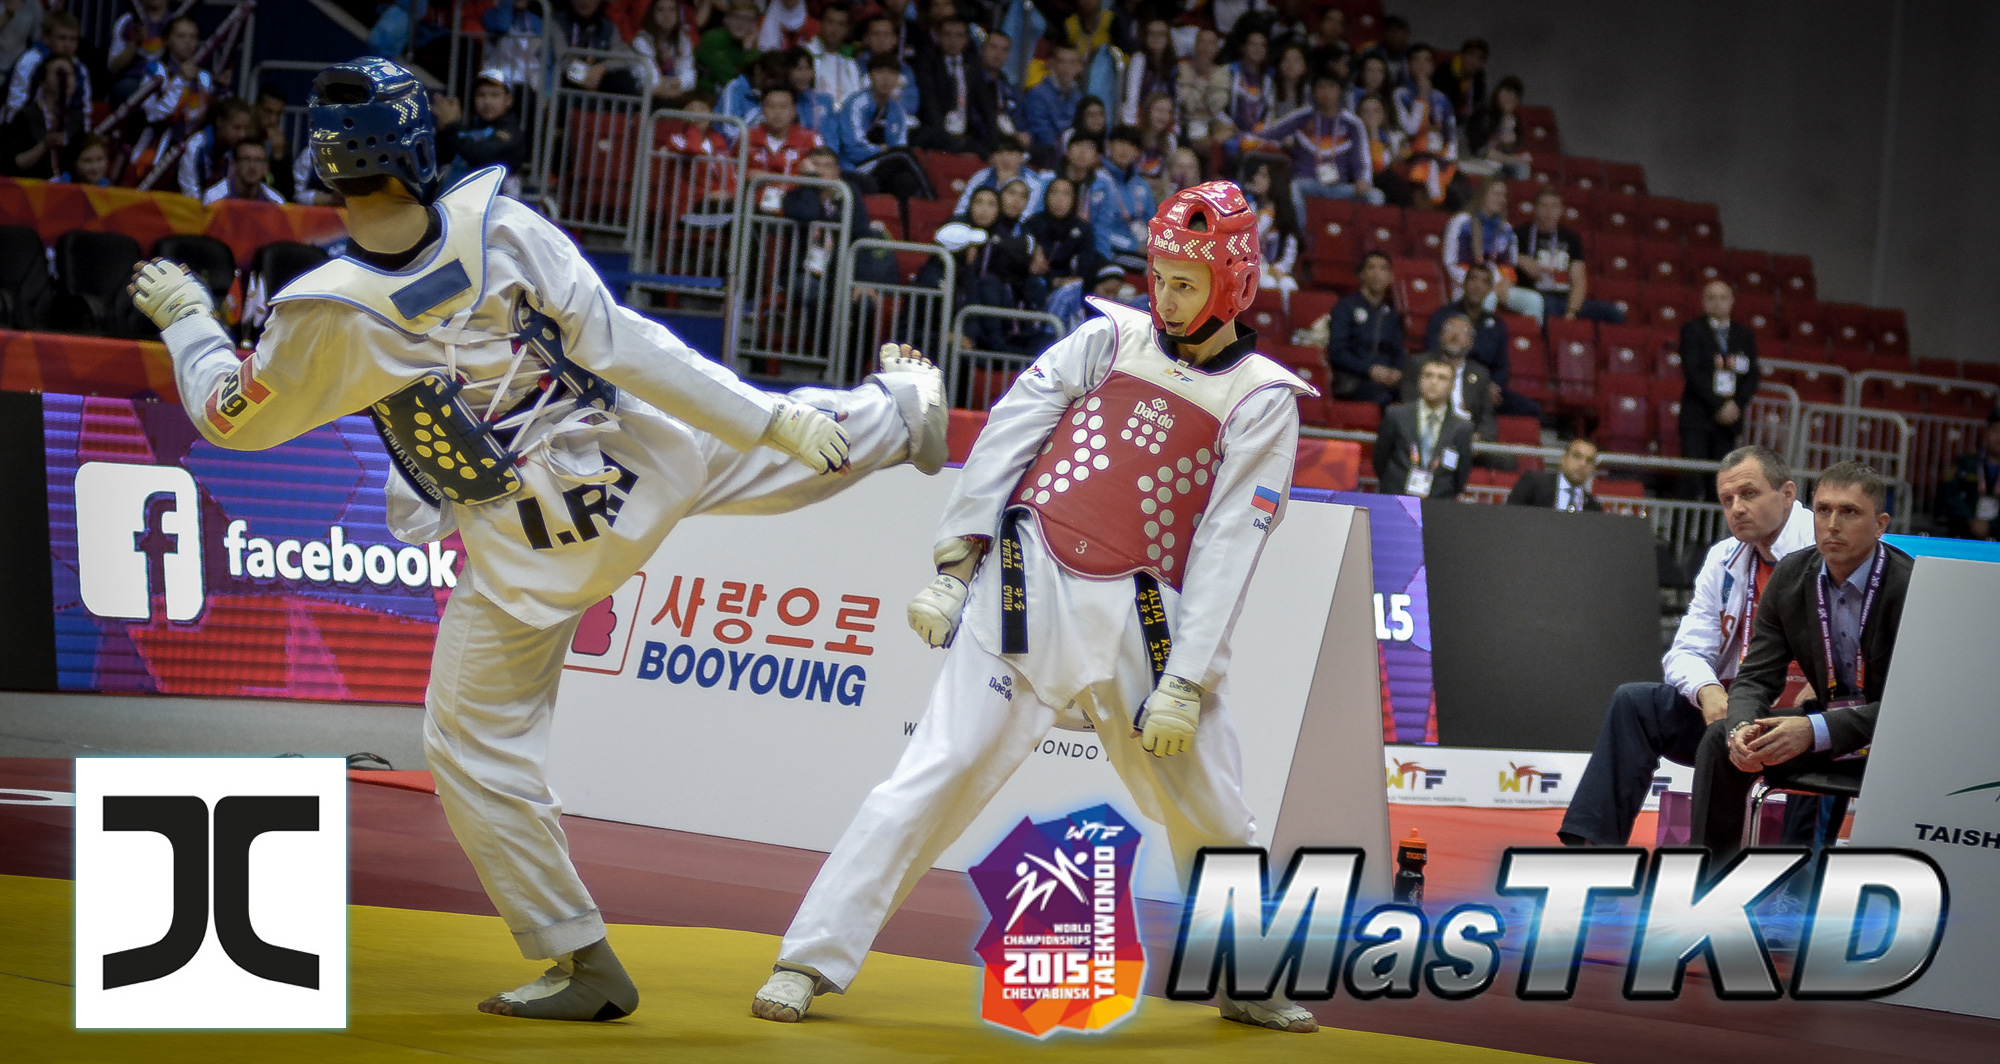 11_Seleccion_JCalicu_Mundial-Taekwondo-D3